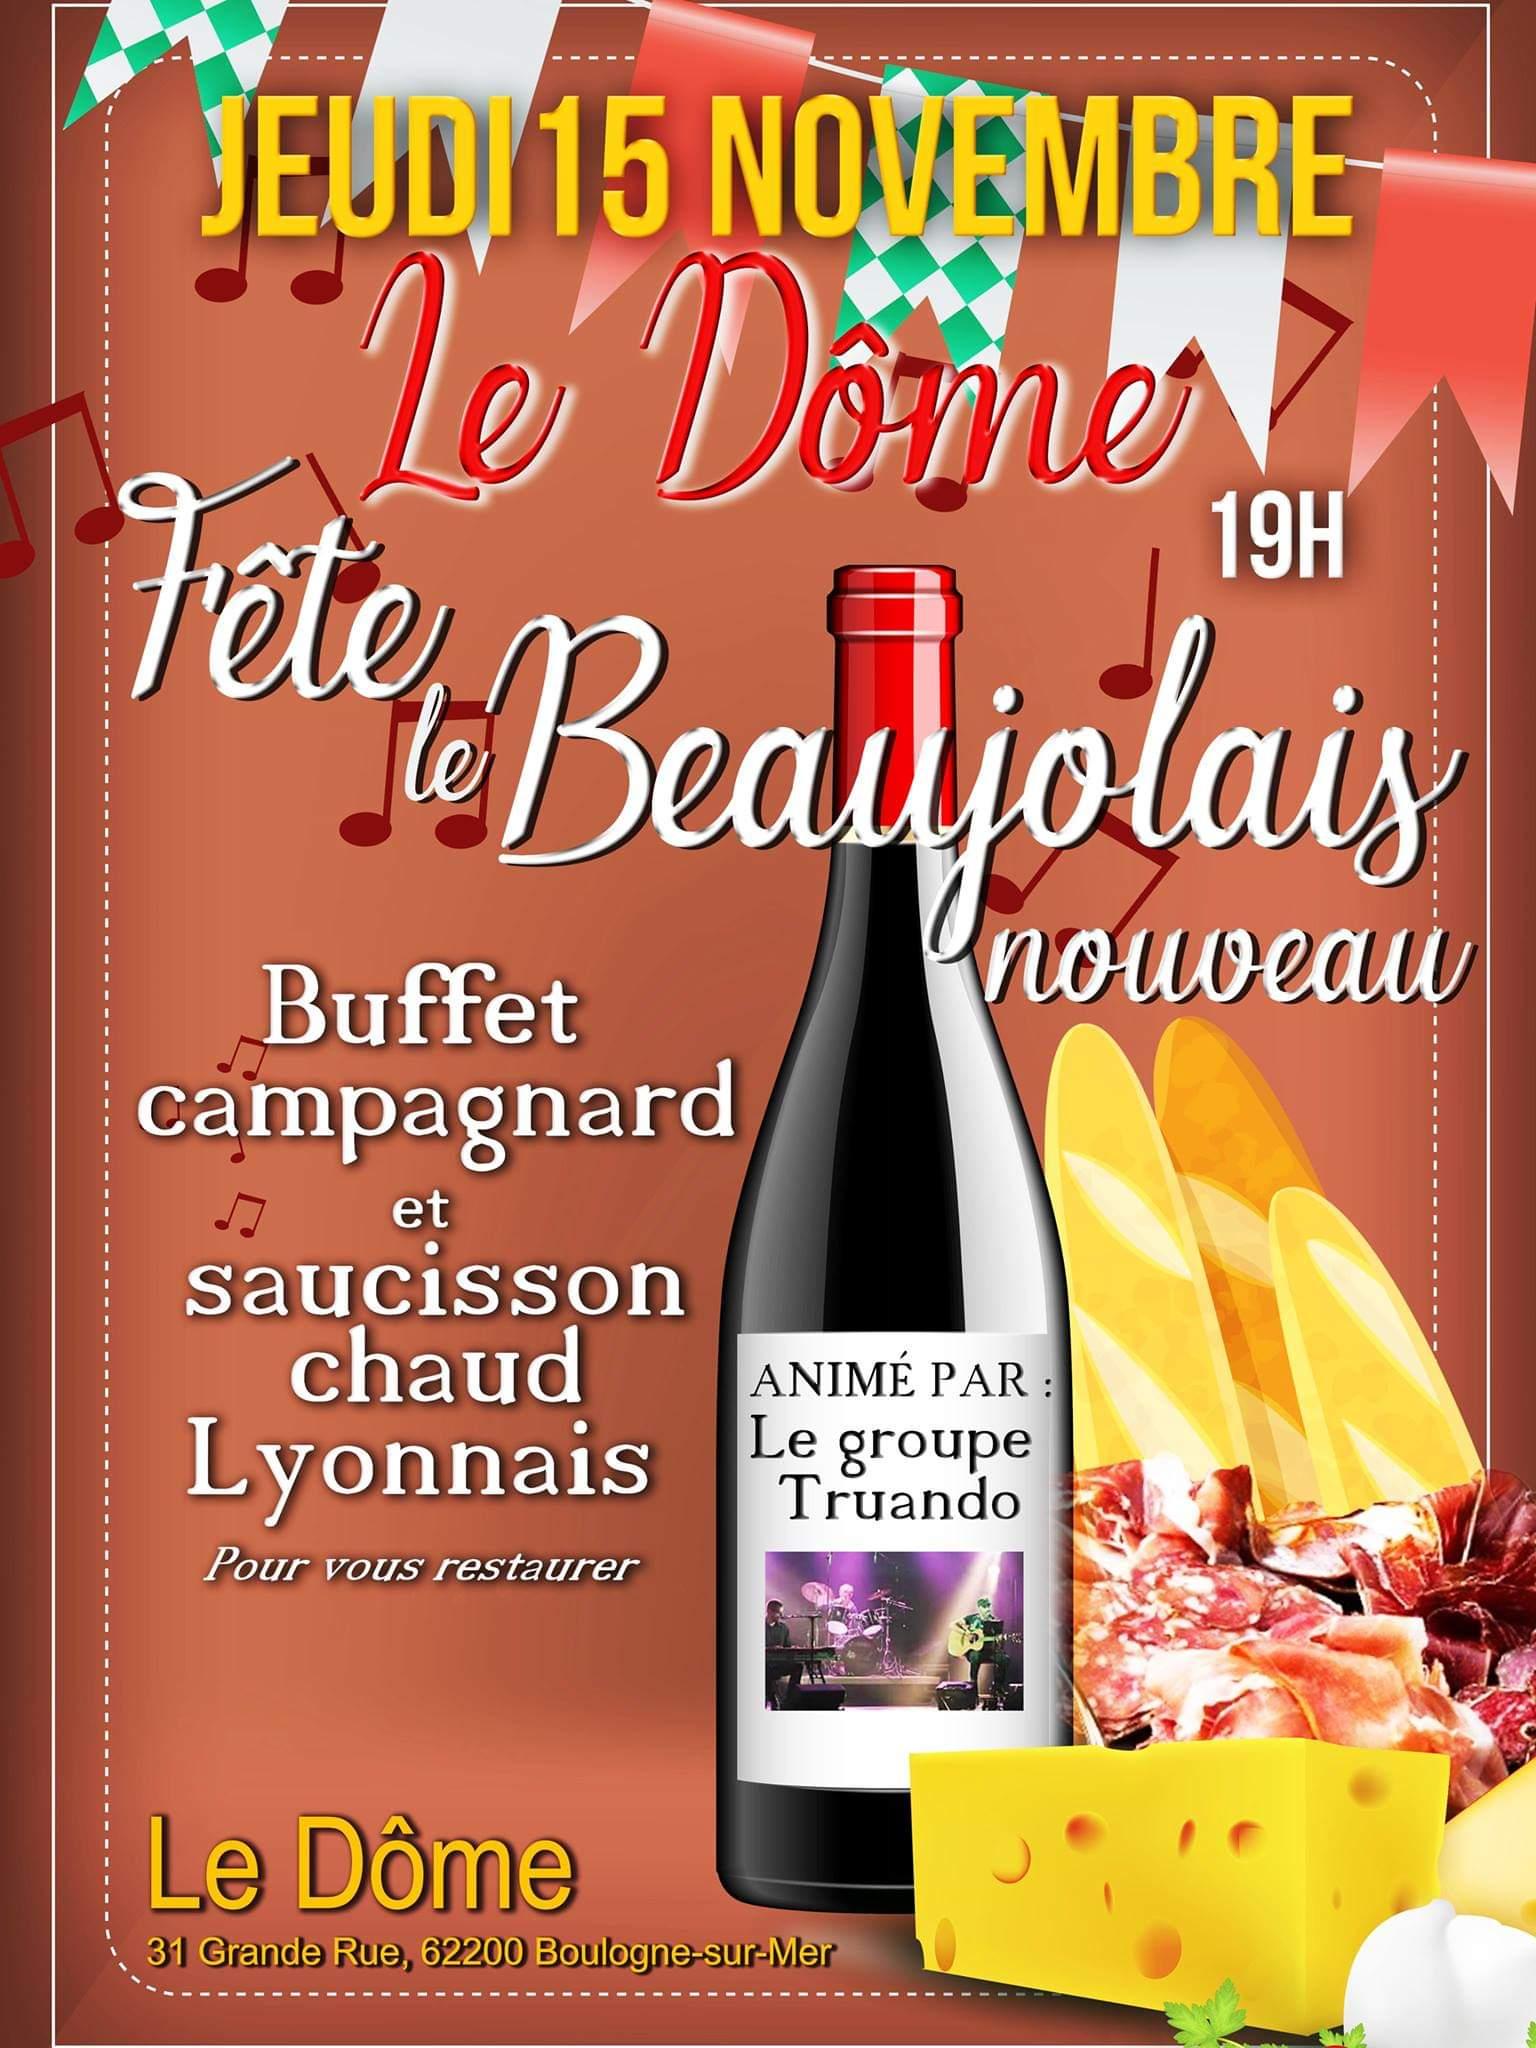 Fête du Beaujolais jeudi 15 novembre 2018